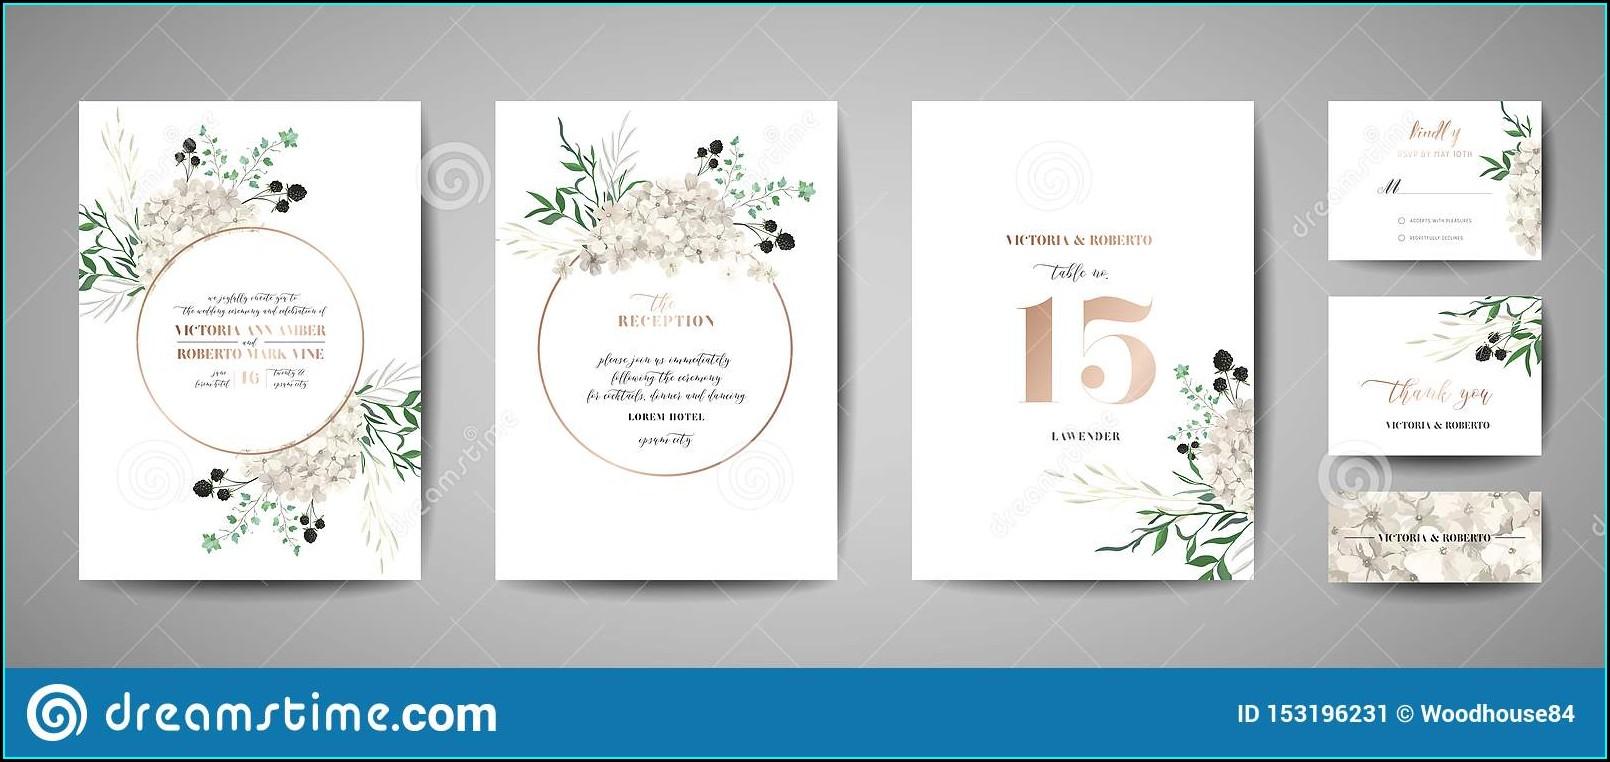 Wedding Invitation Card Rustic Design